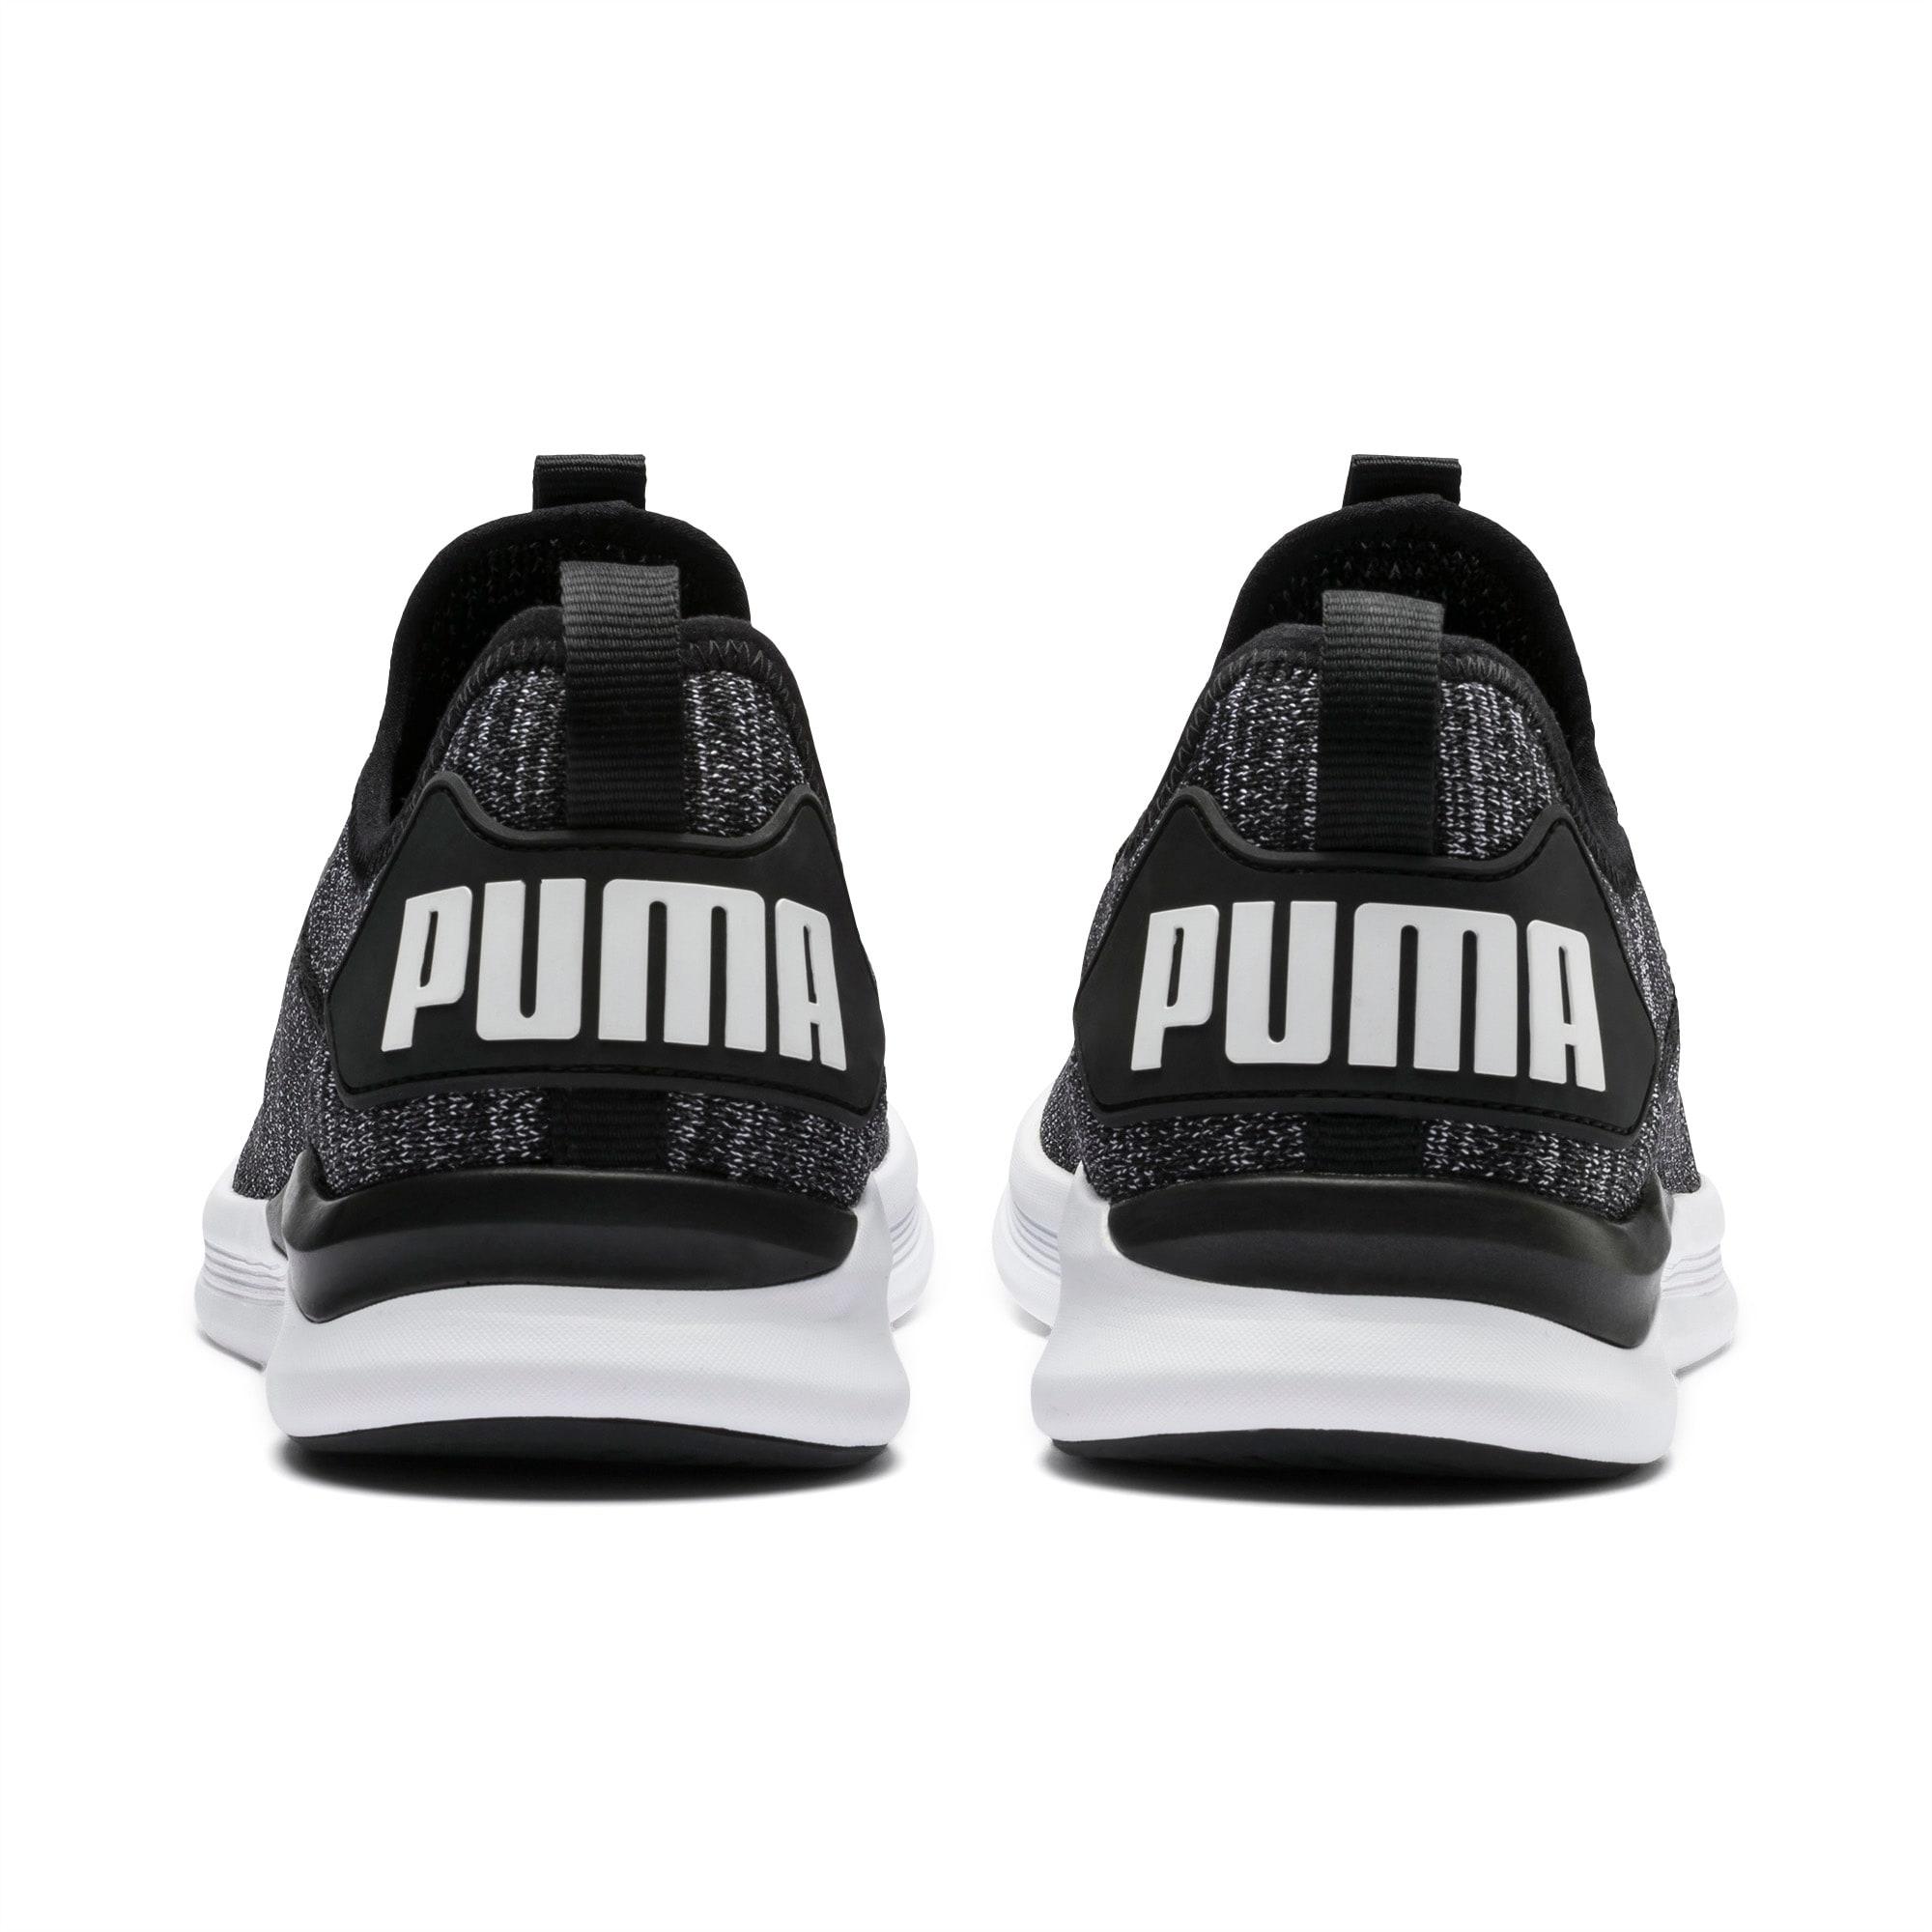 Buty PUMA Ignite Flash EvoKnit 190508 02 BlackAsphaltWhite